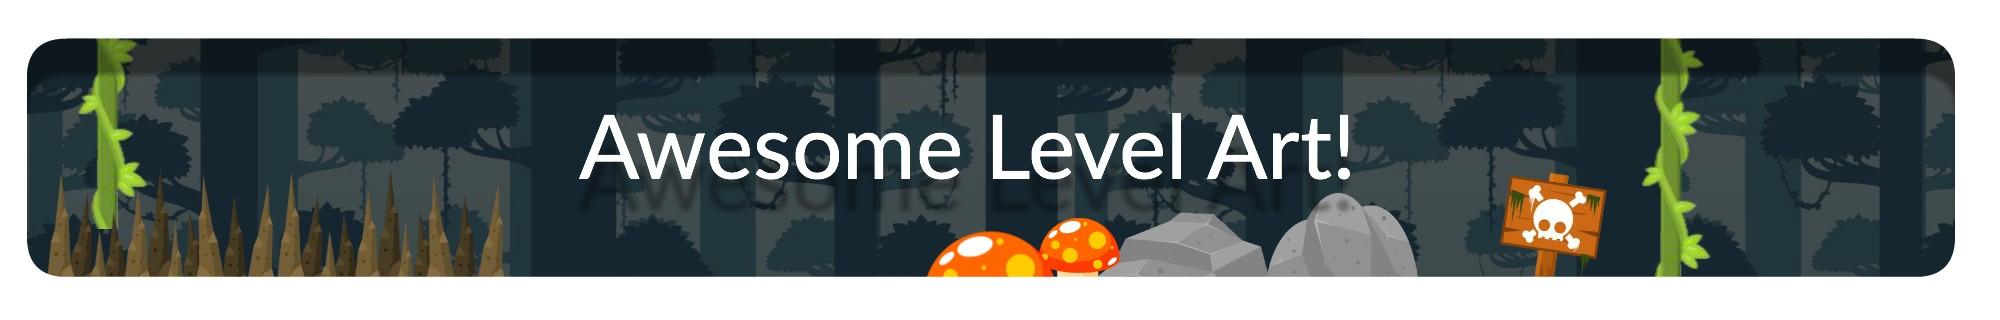 Level Art